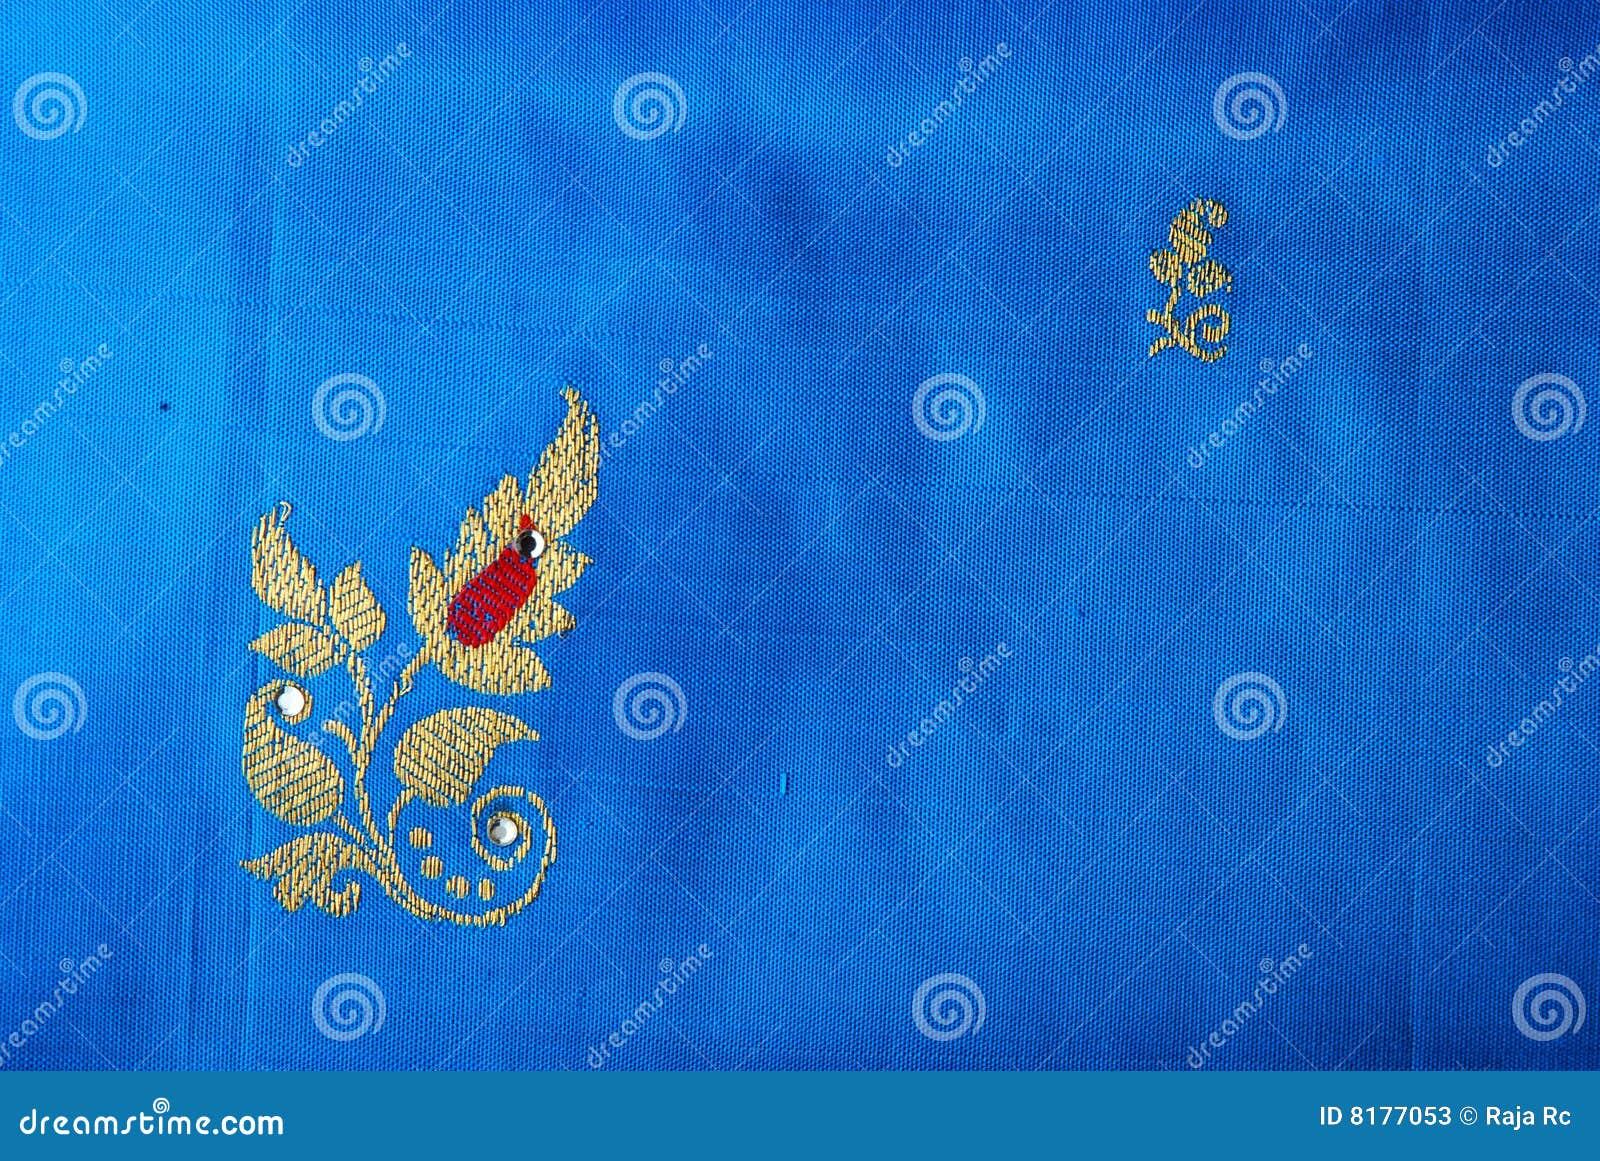 silk saree stock image  image of floral  creativity  tamilnadu